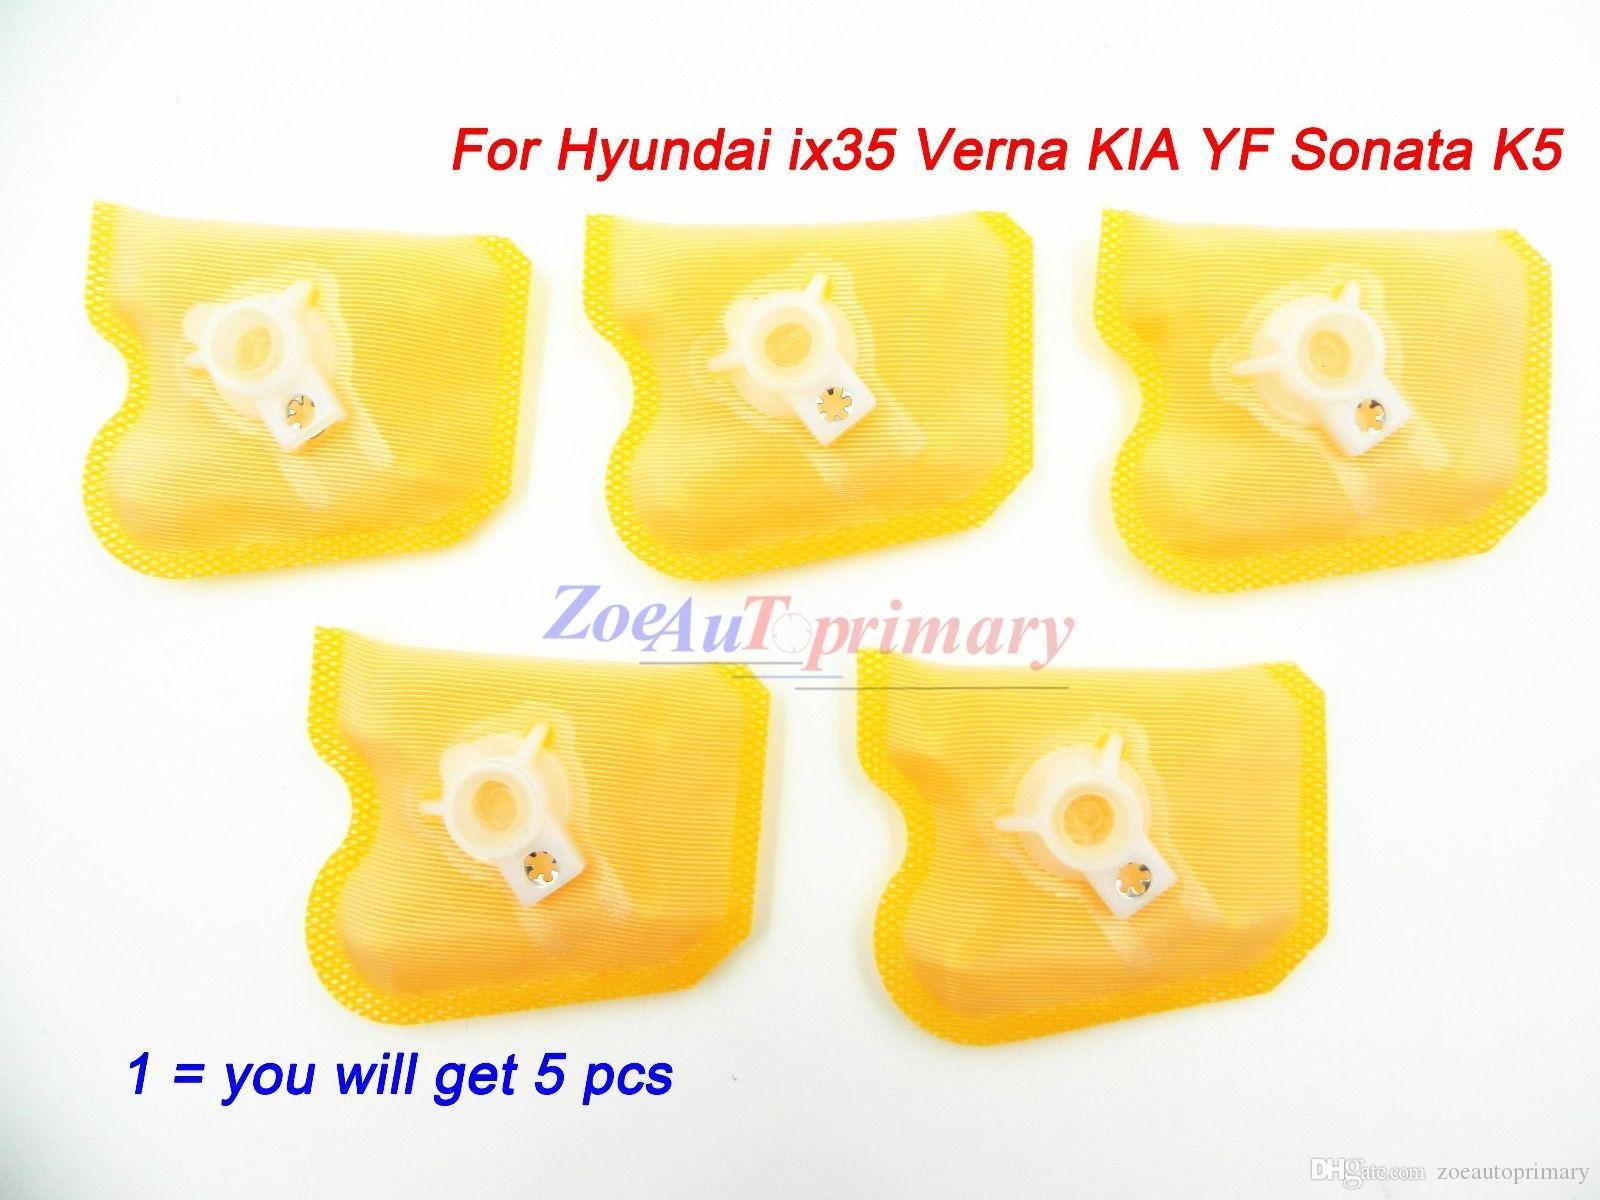 Strainer Fuel Pump Filter For Hyundai Ix35 Verna Kia Sonata K5 531060 2p000 Online With 711 Piece On